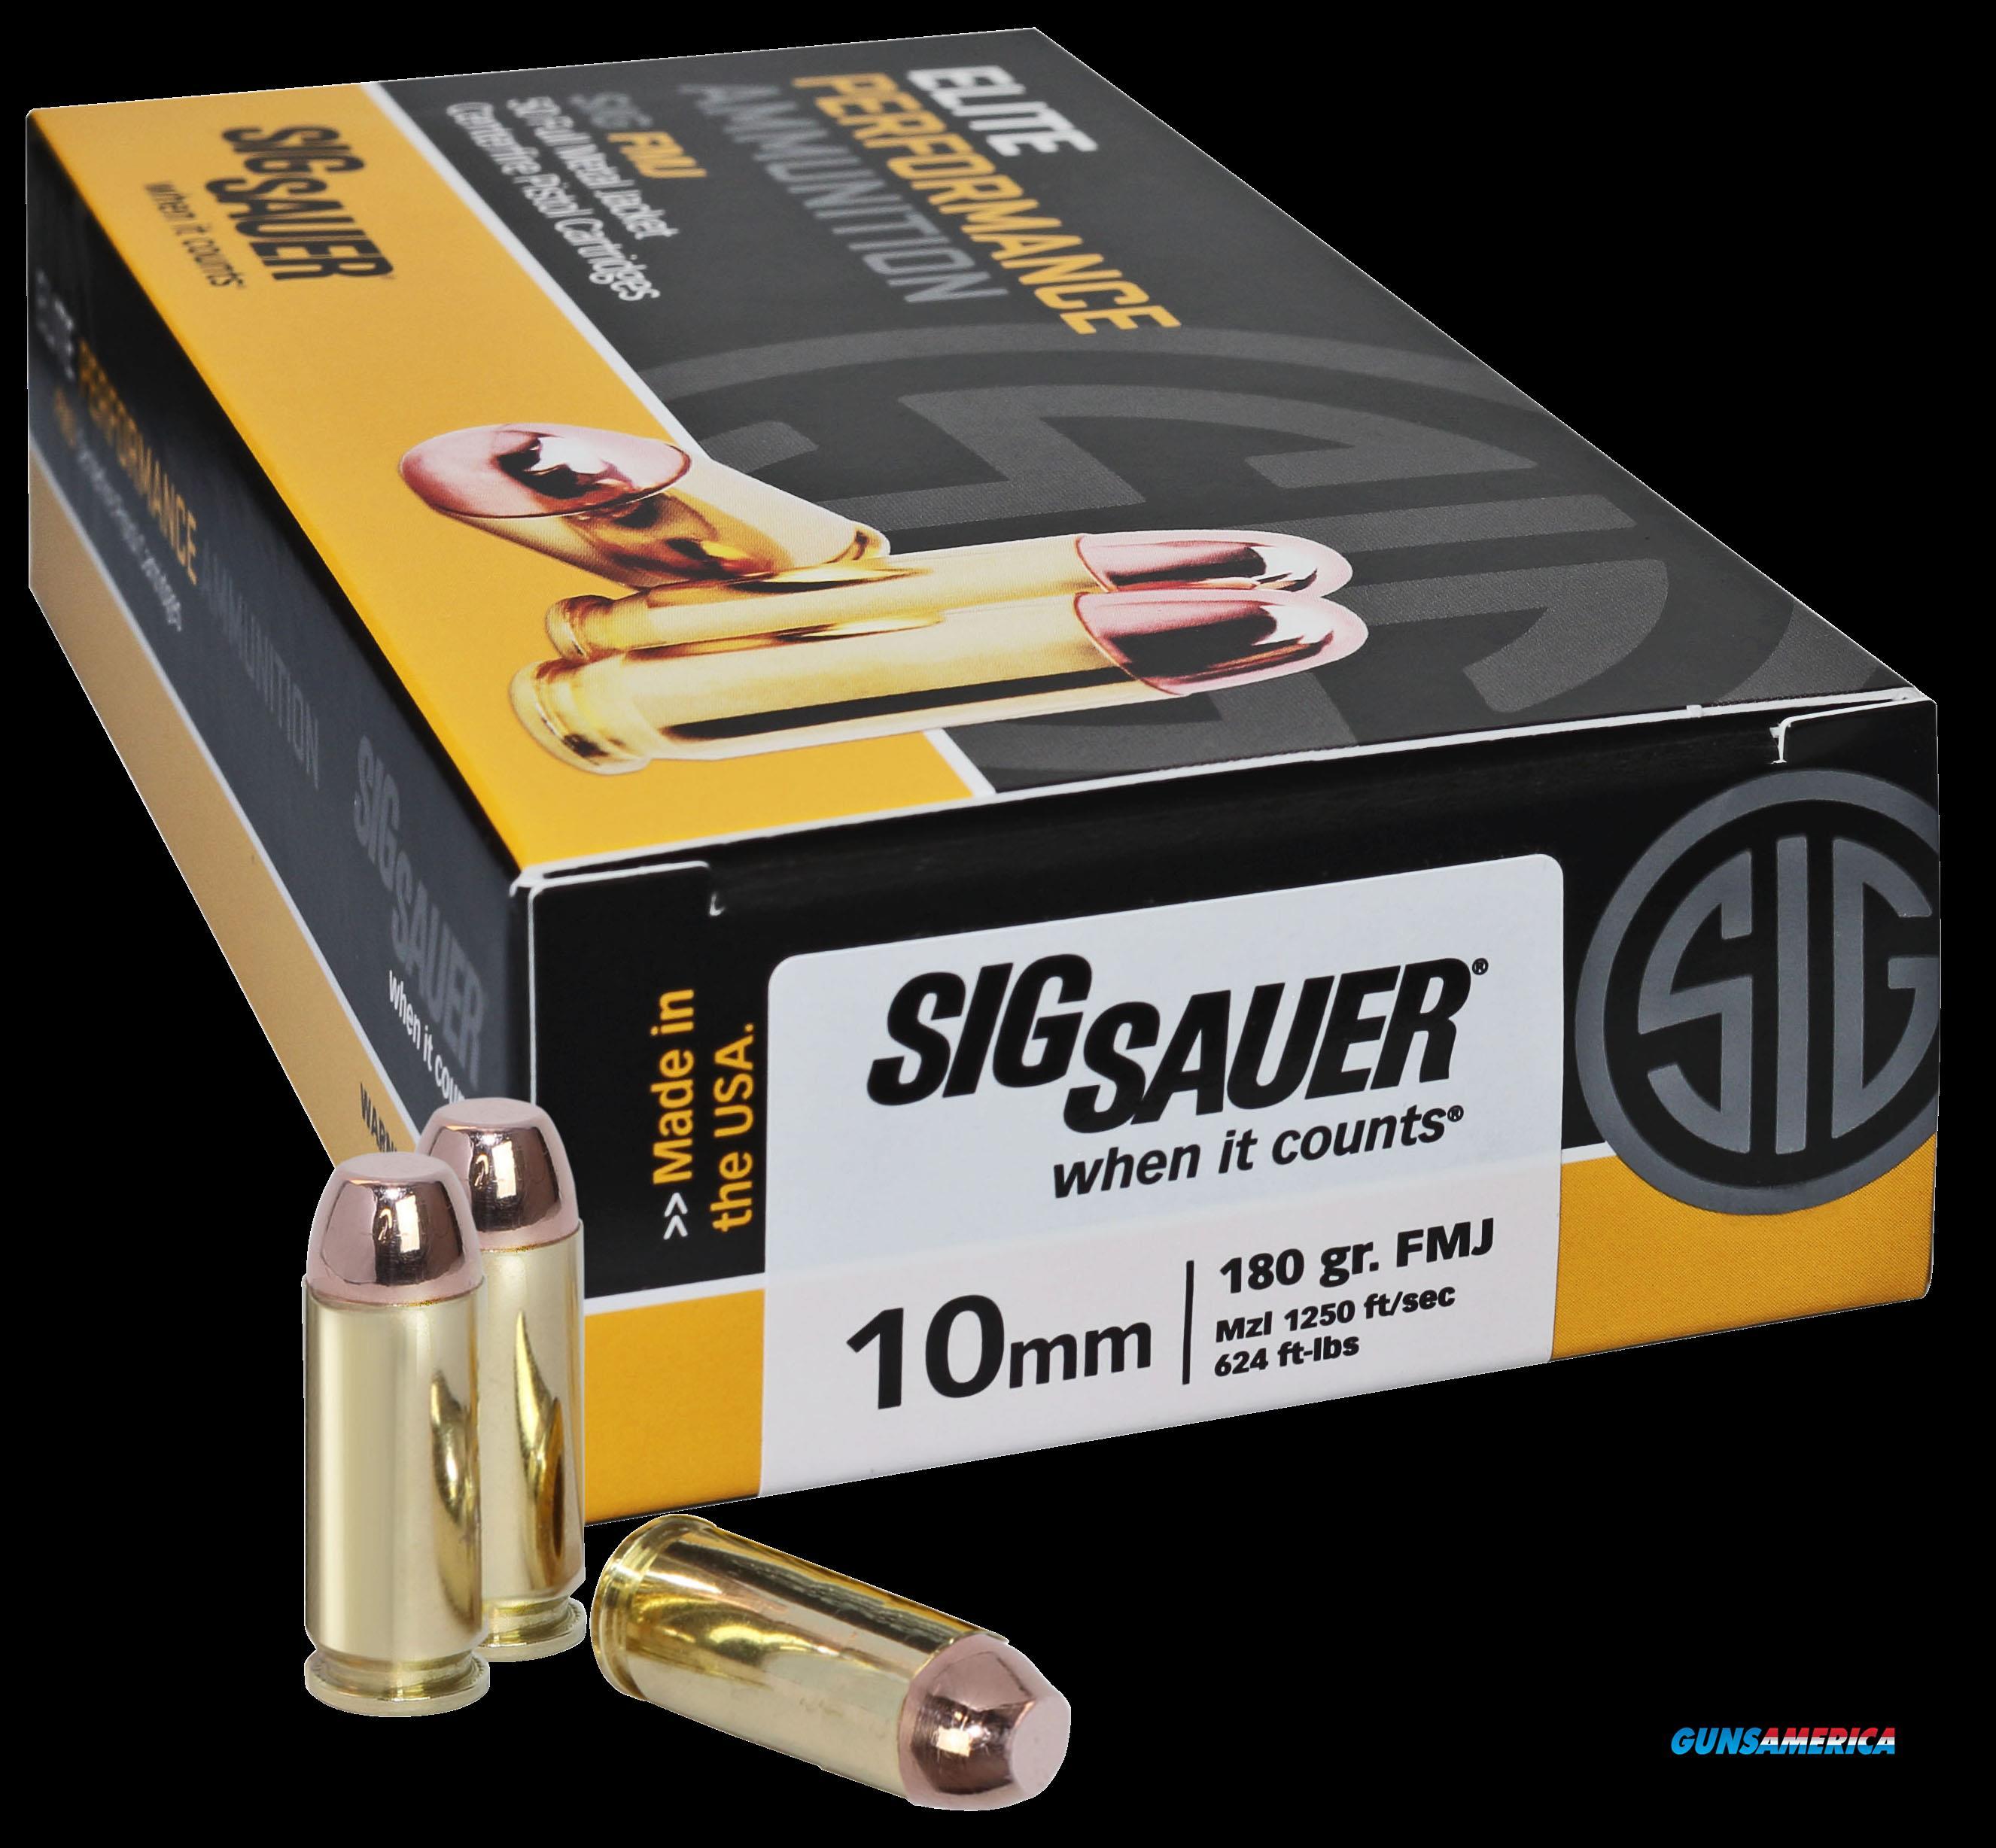 Sig Sauer Elite Ball, Sig E10mb1-50     10mm    180 Fmj Elite 50-20  Guns > Pistols > 1911 Pistol Copies (non-Colt)